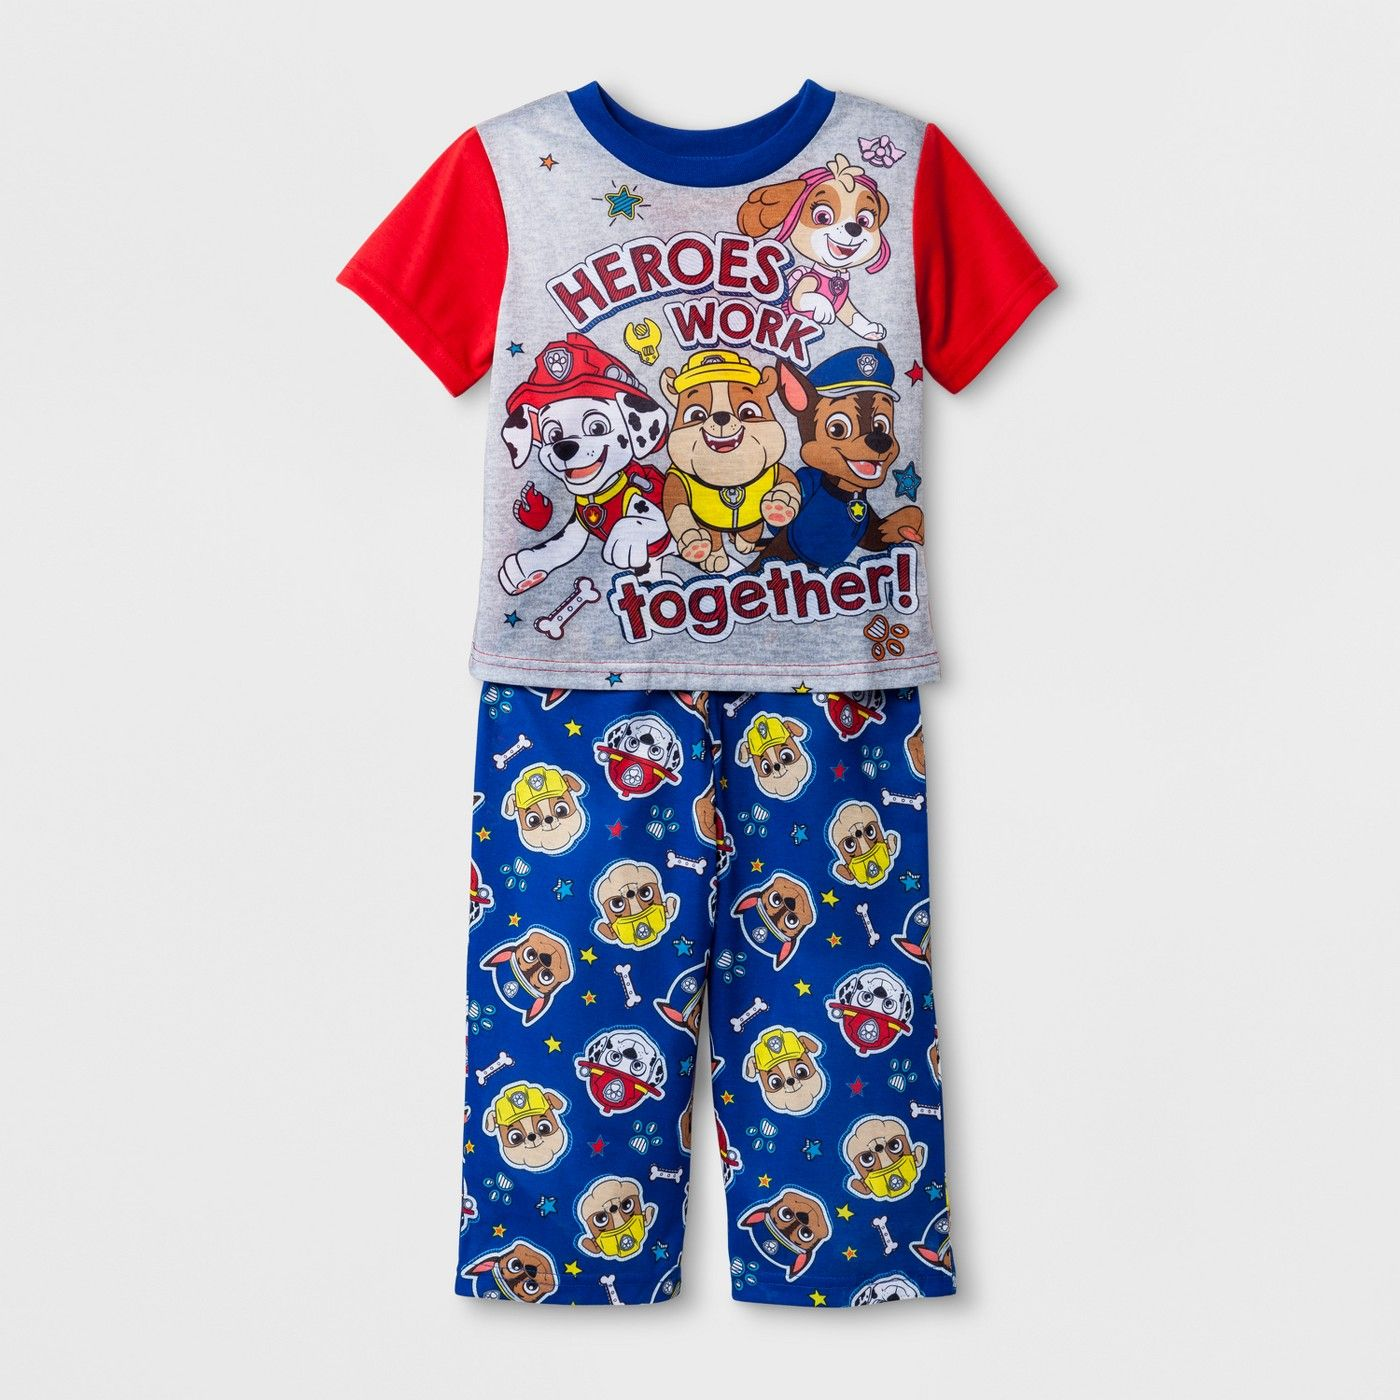 c68b72262 Toddler Boys  PAW Patrol 2pc Pajama Set - Red 5T  PAW